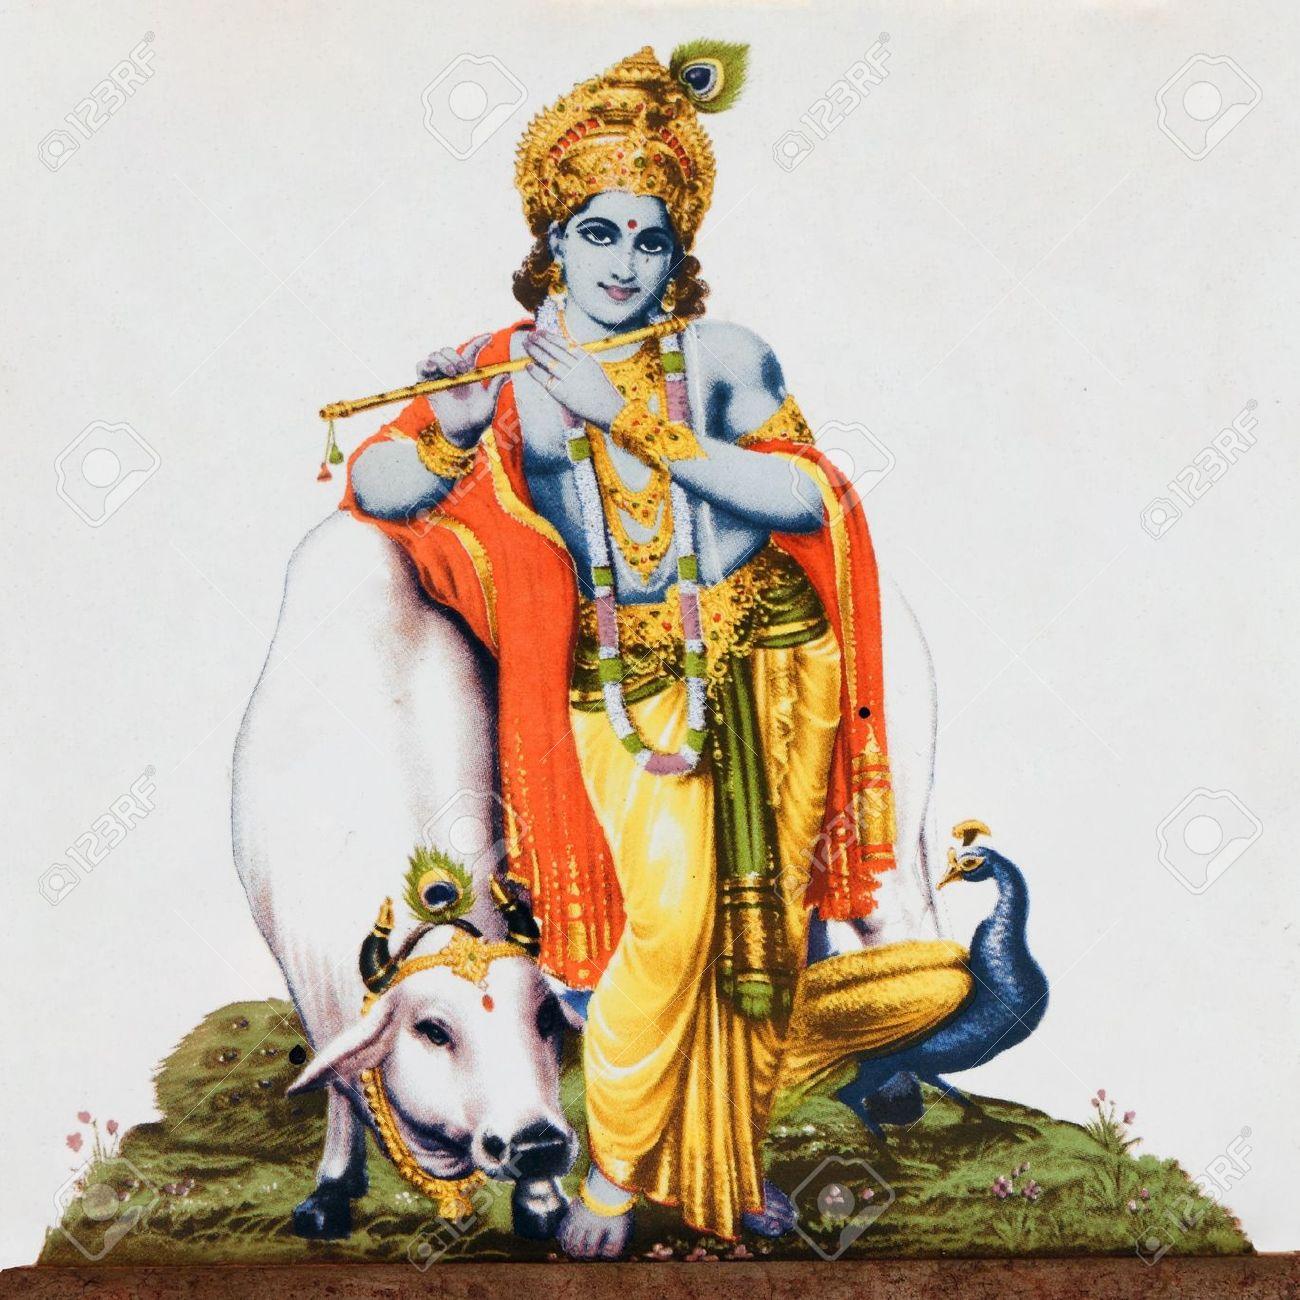 Krishna Art Stock Photos Images - Indian Cow With Krishna PNG